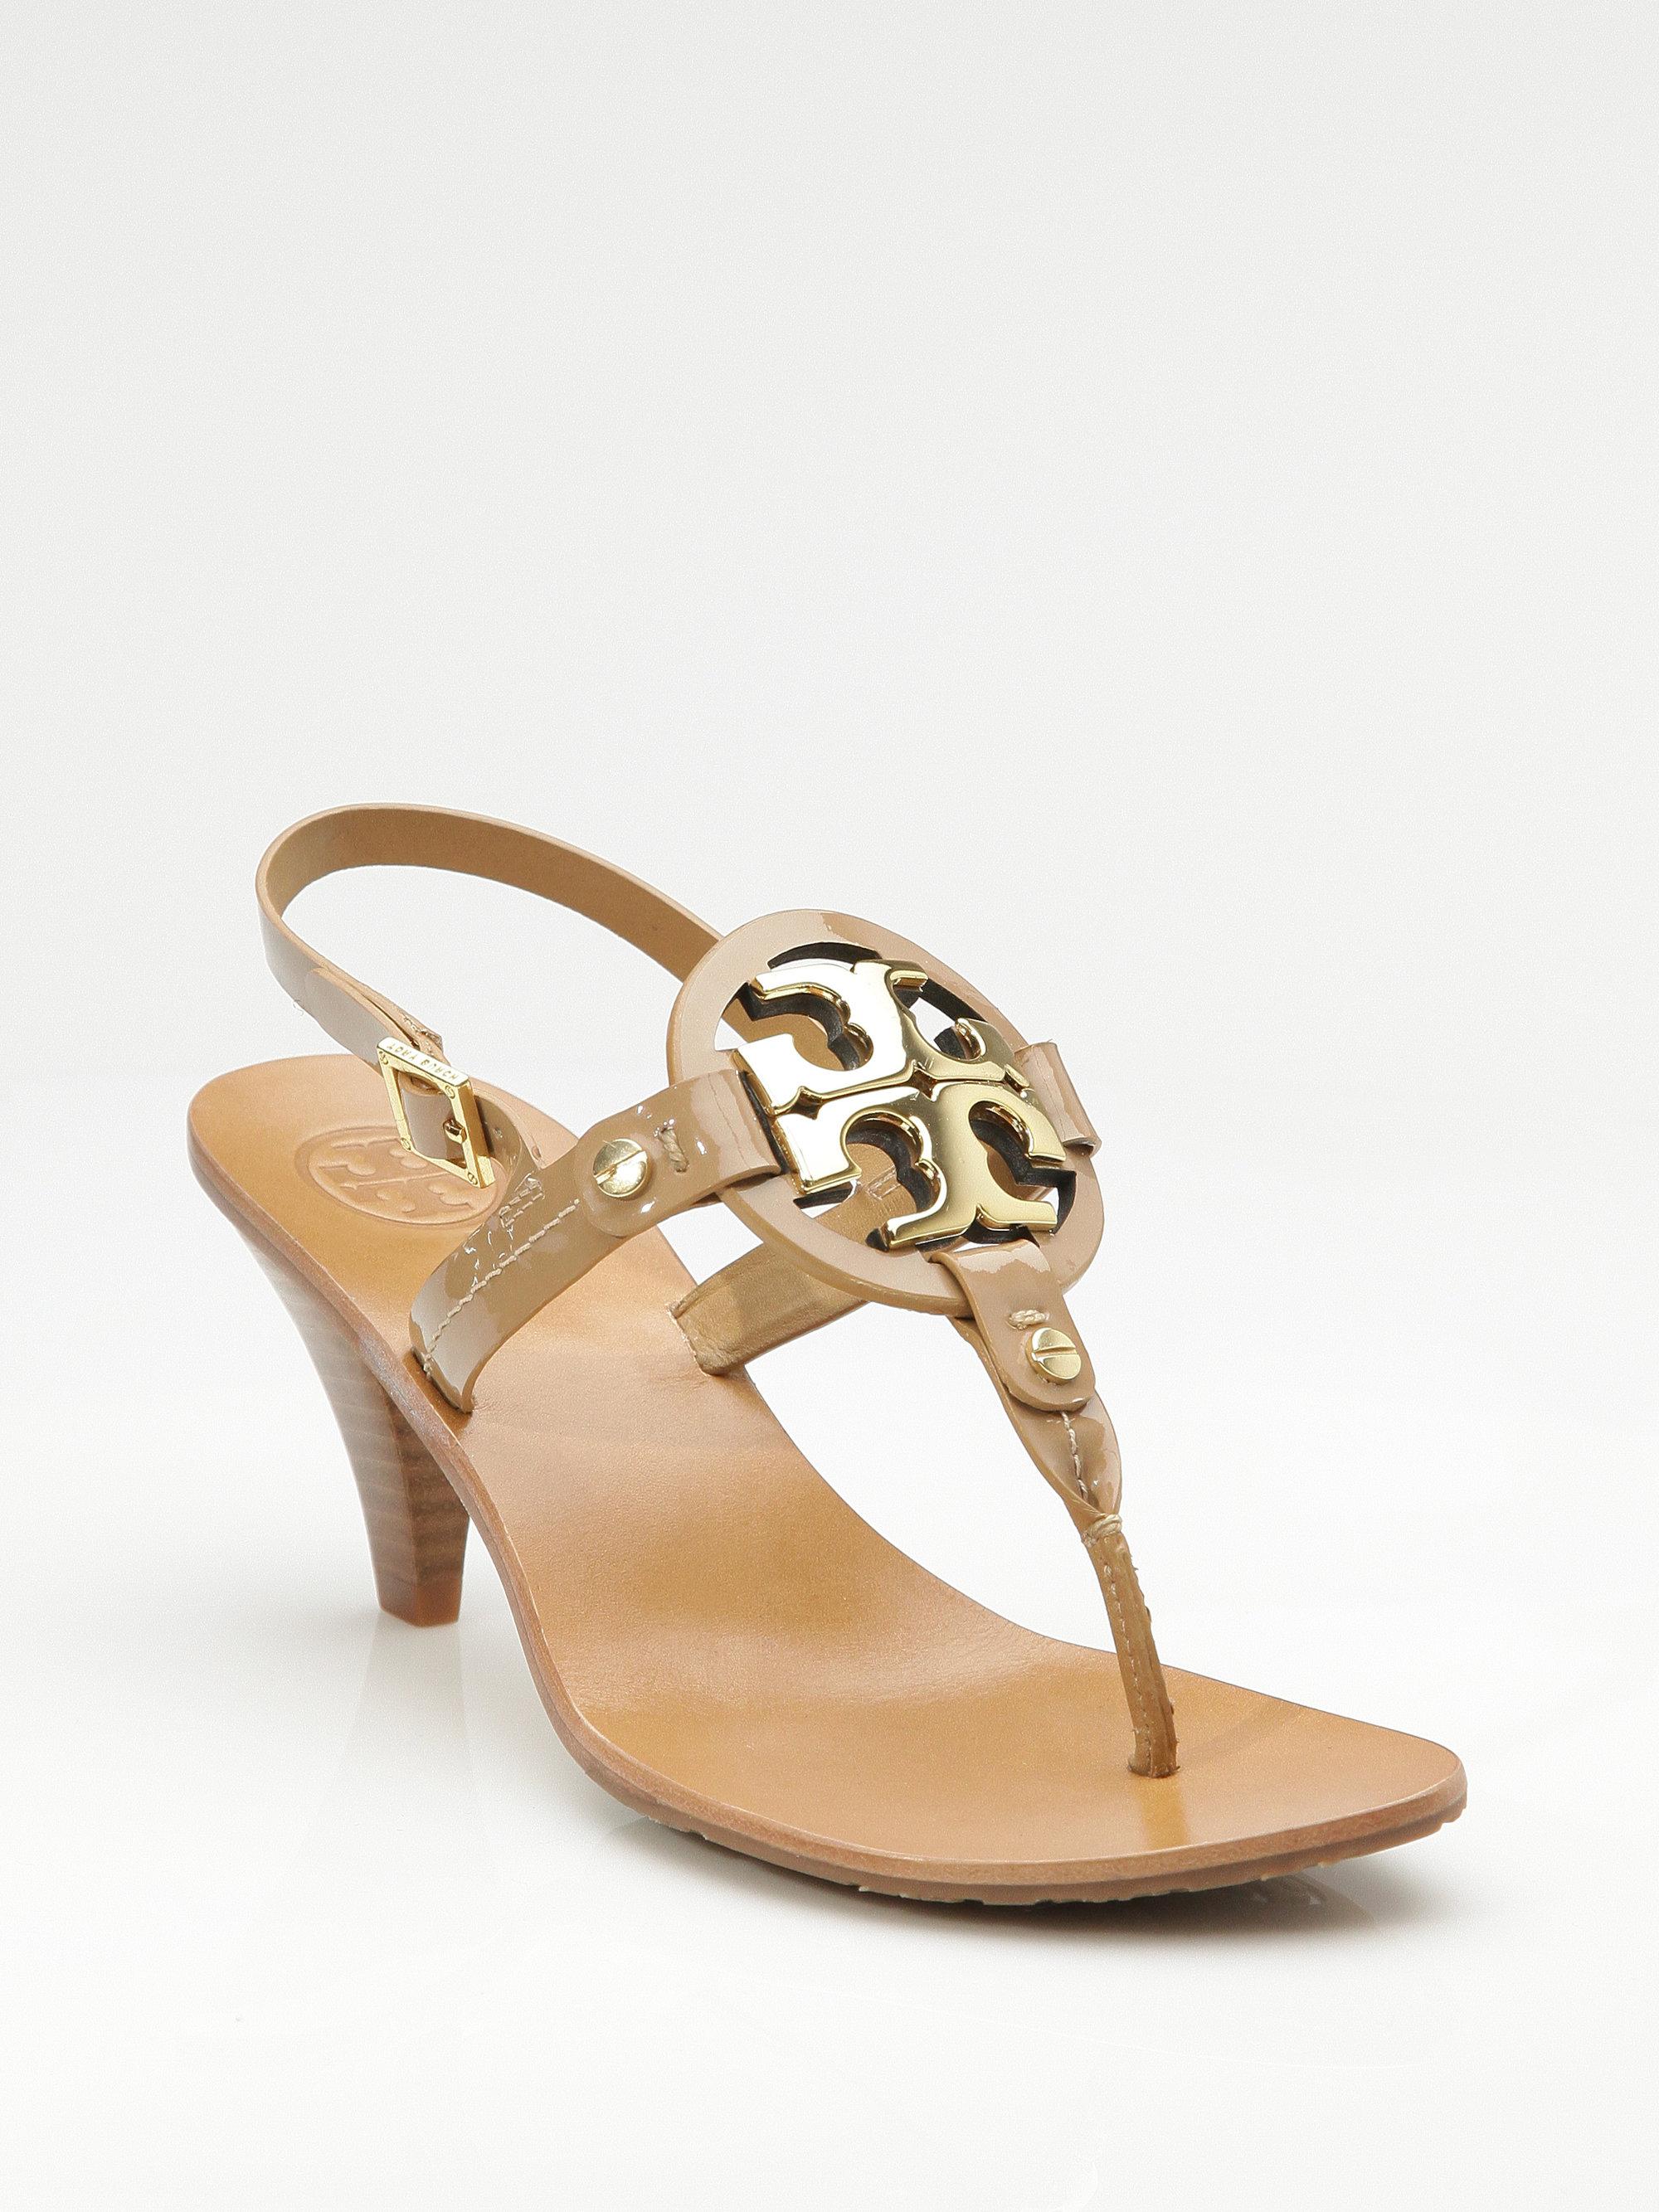 1609f703b5e4 Lyst - Tory Burch Holly 2 Kitten Heel Logo Patent Thong Sandals in ...